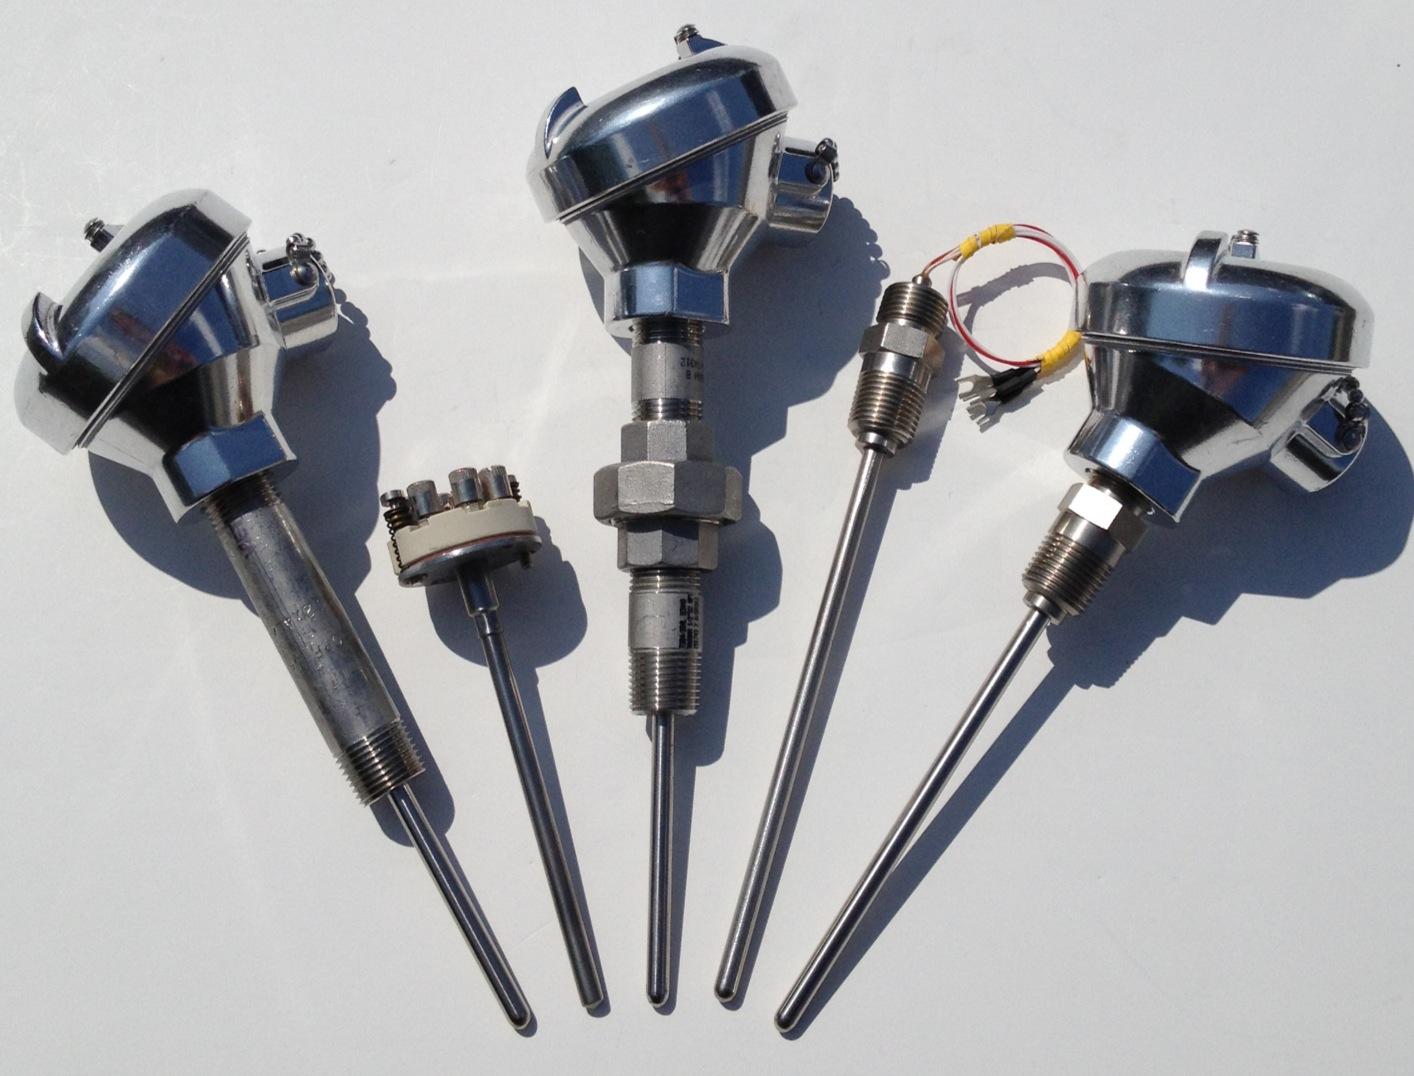 High Temperature Vibration Resistant RTD Sensor